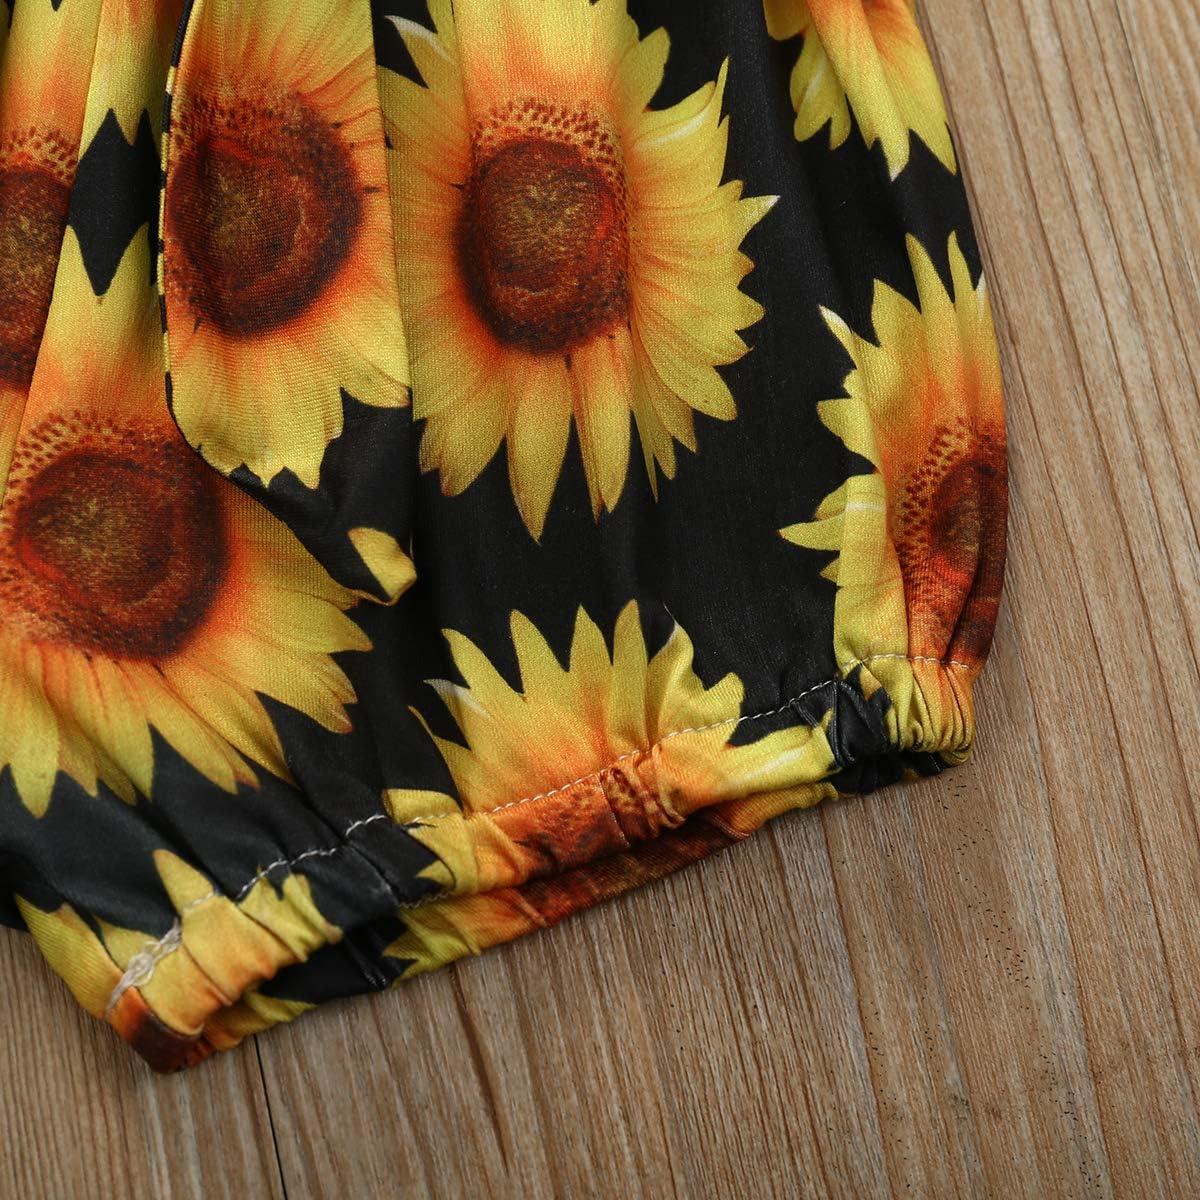 parte superior de girasol Geagodelia pantalones cortos con diadema 3 piezas Juego de ropa para beb/é reci/én nacido con volantes de verano manga corta